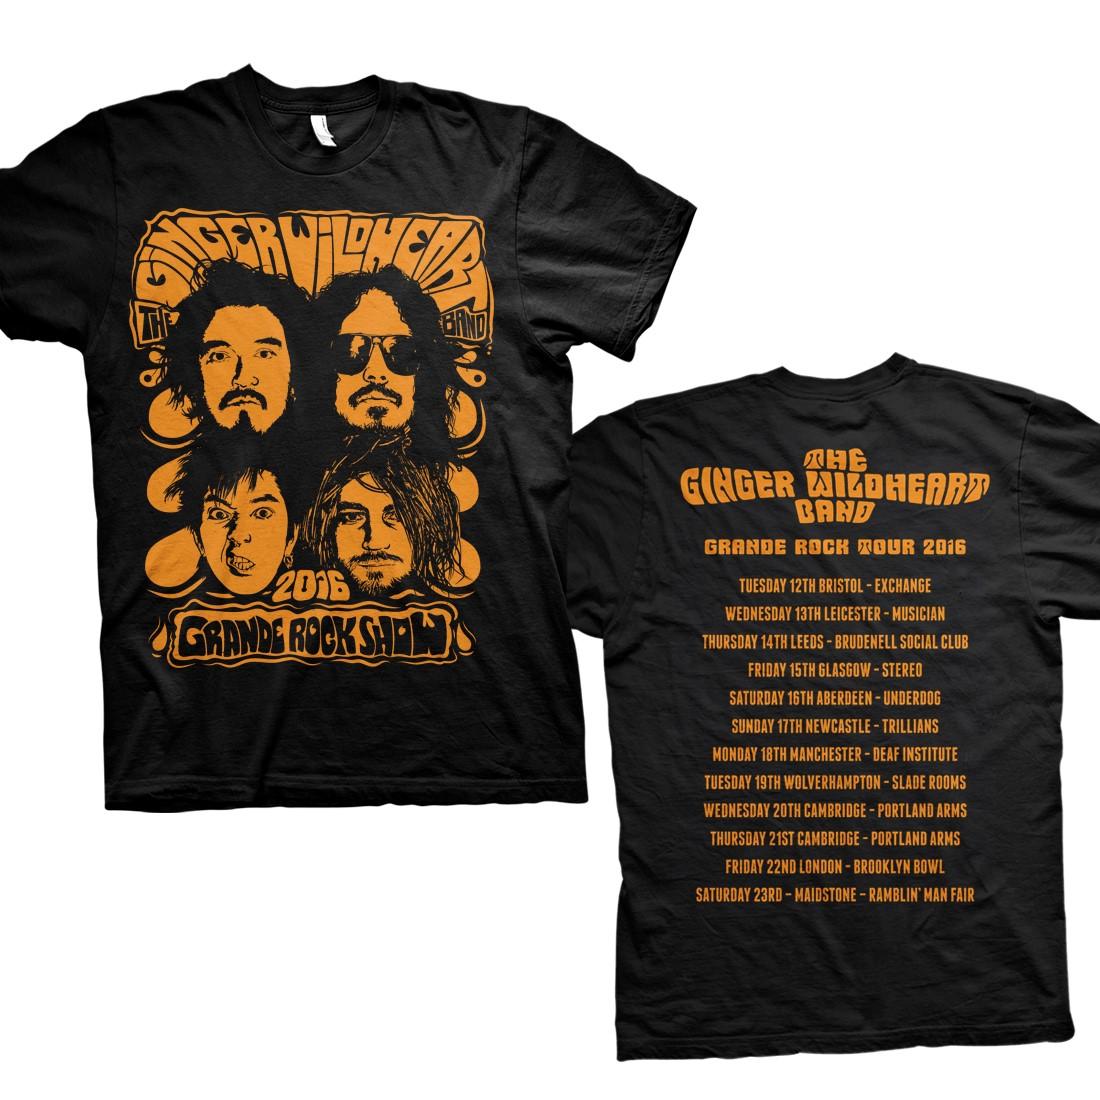 Grande Rock Tour – Tee